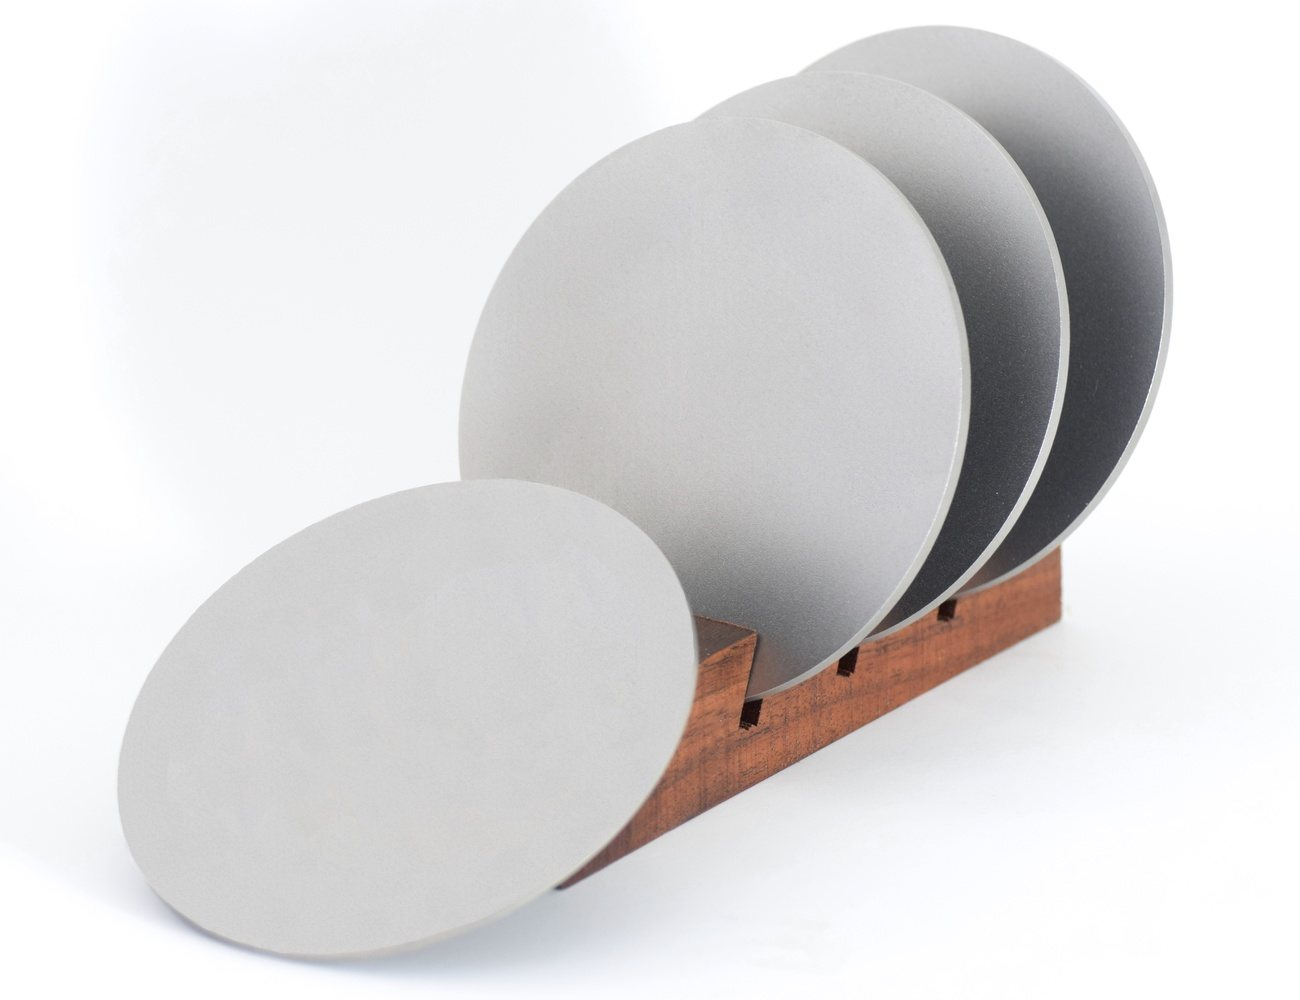 Titanium Drink Coasters – Minimal Modern Design